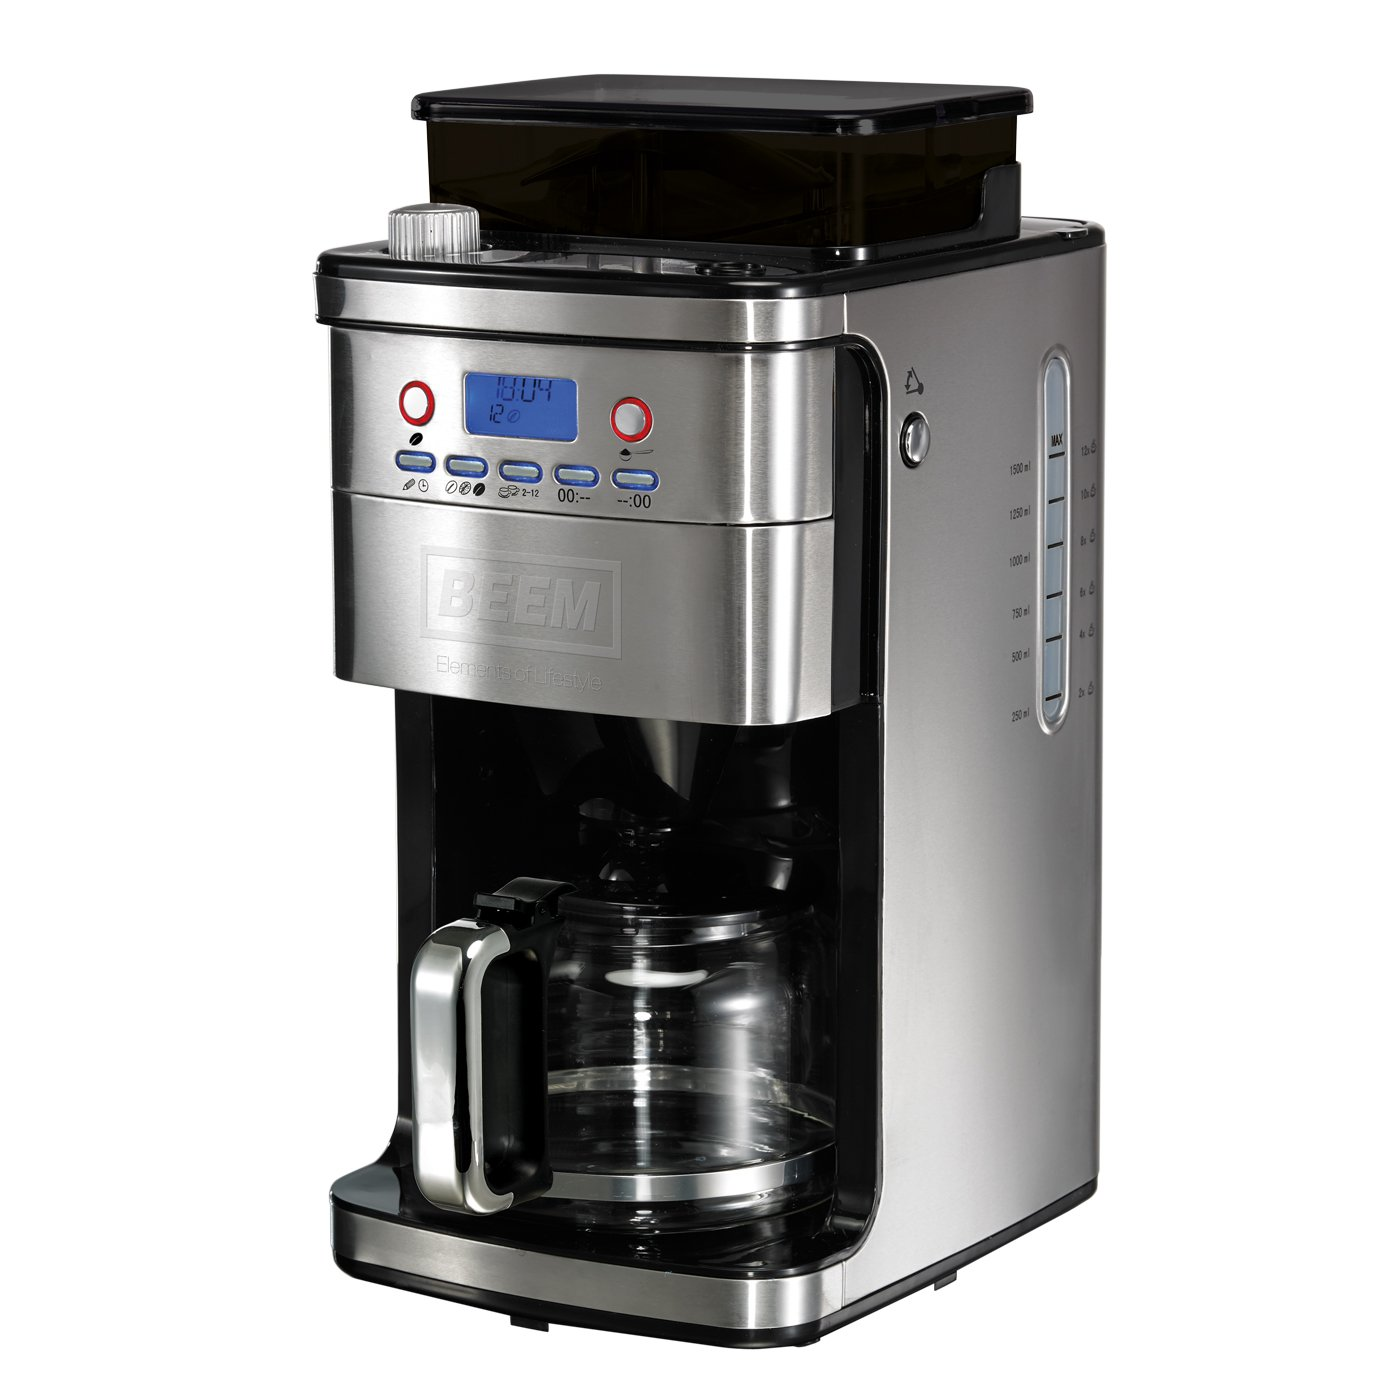 BEEM Germany Fresh Aroma Perfect Superior Cafetera completamente automática mecanismo molturador cónico